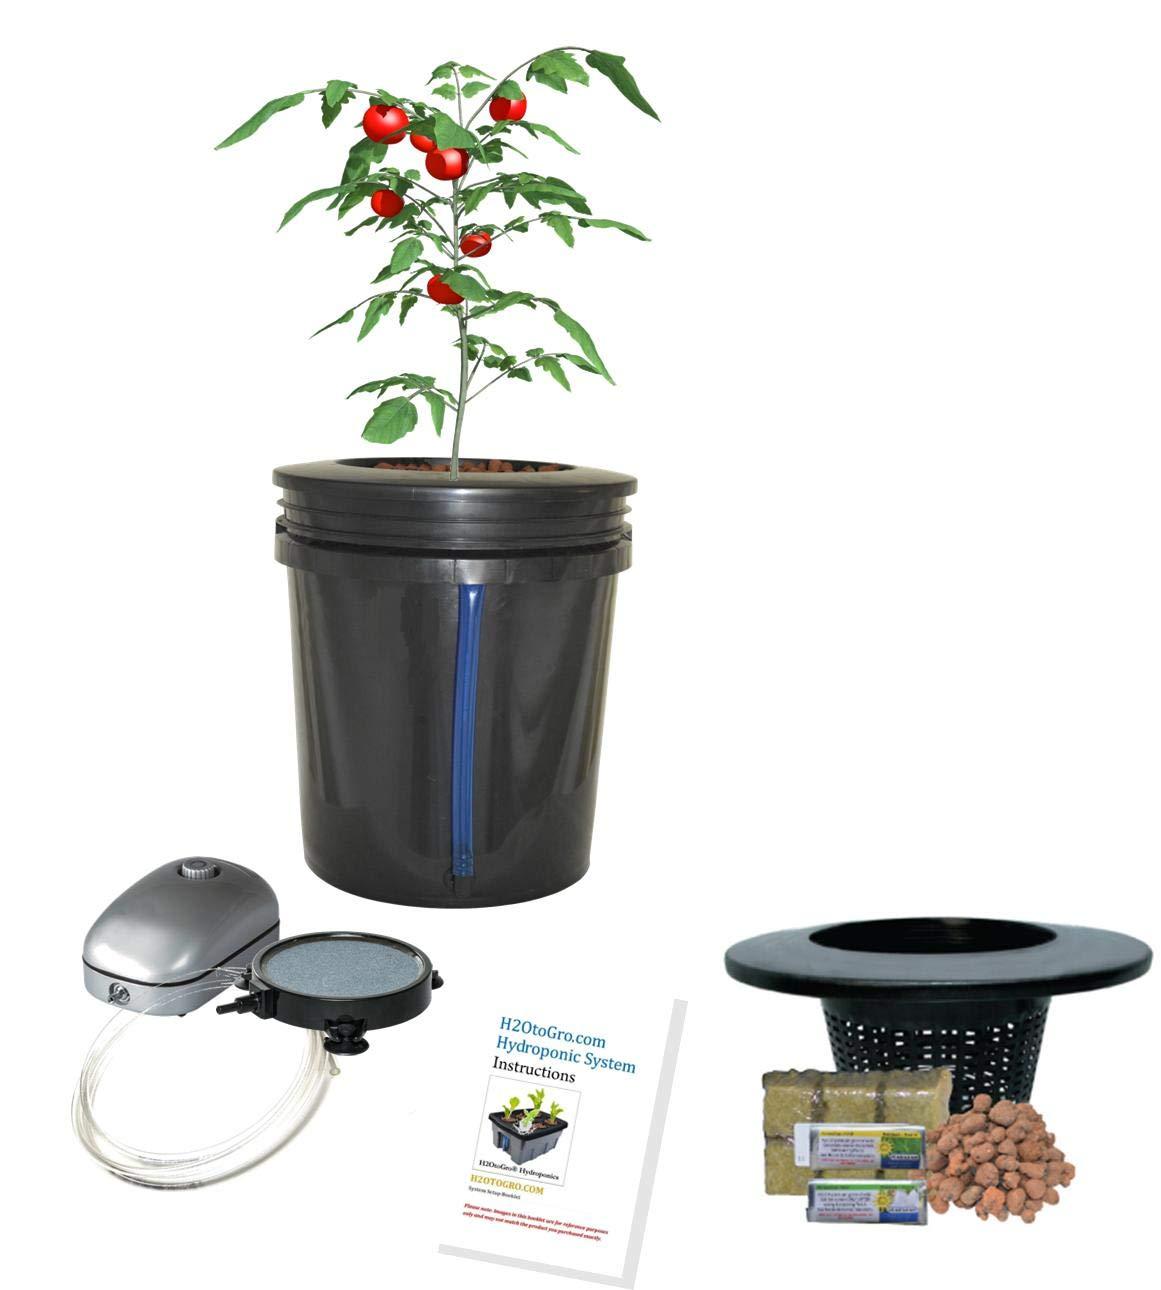 Hydroponic system Complete DWC BUBBLER Bucket Kit 5-gal